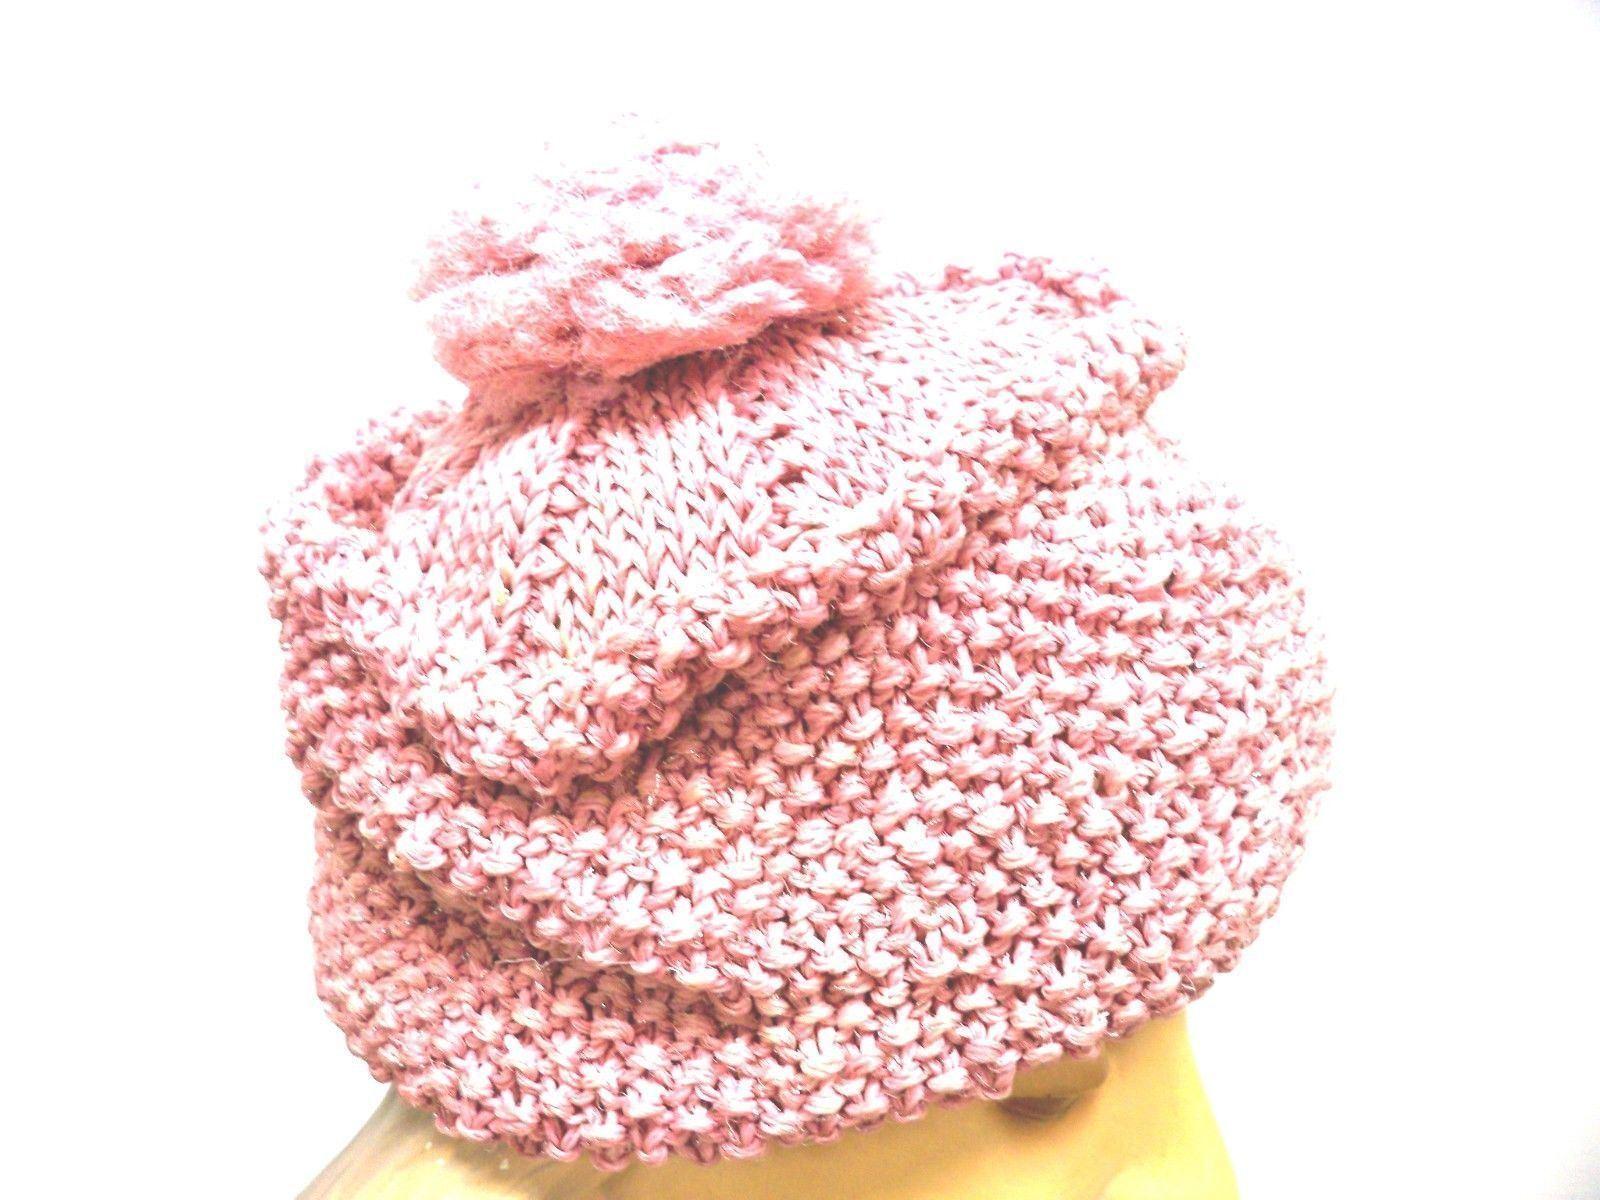 VTG Knit Hat Dusty Rose Pink Metallic Hand-Knit 1… - image 6